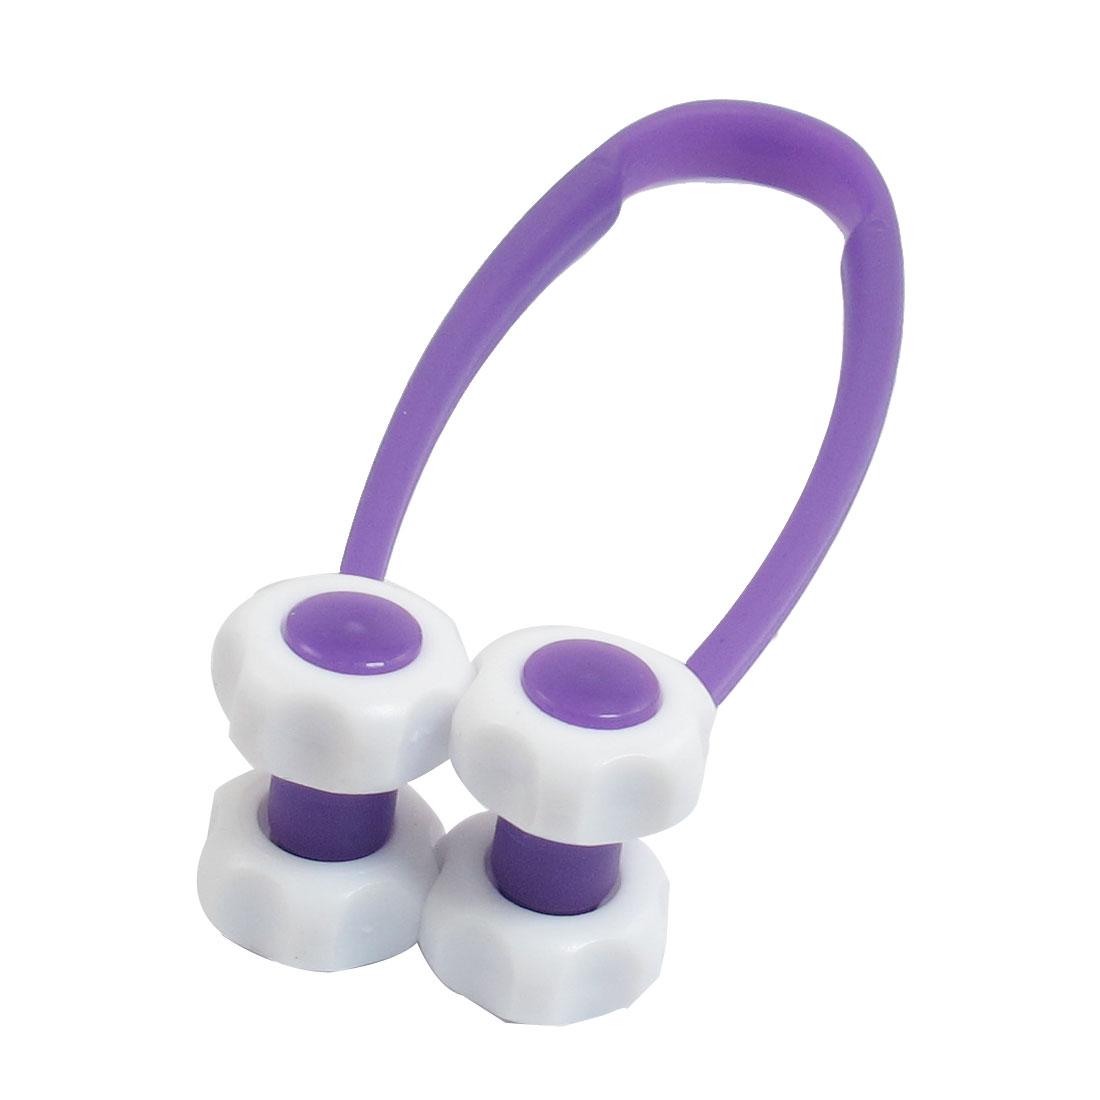 Beaty Tool Purple White Plastic 4 Flower Roller Facial Massager